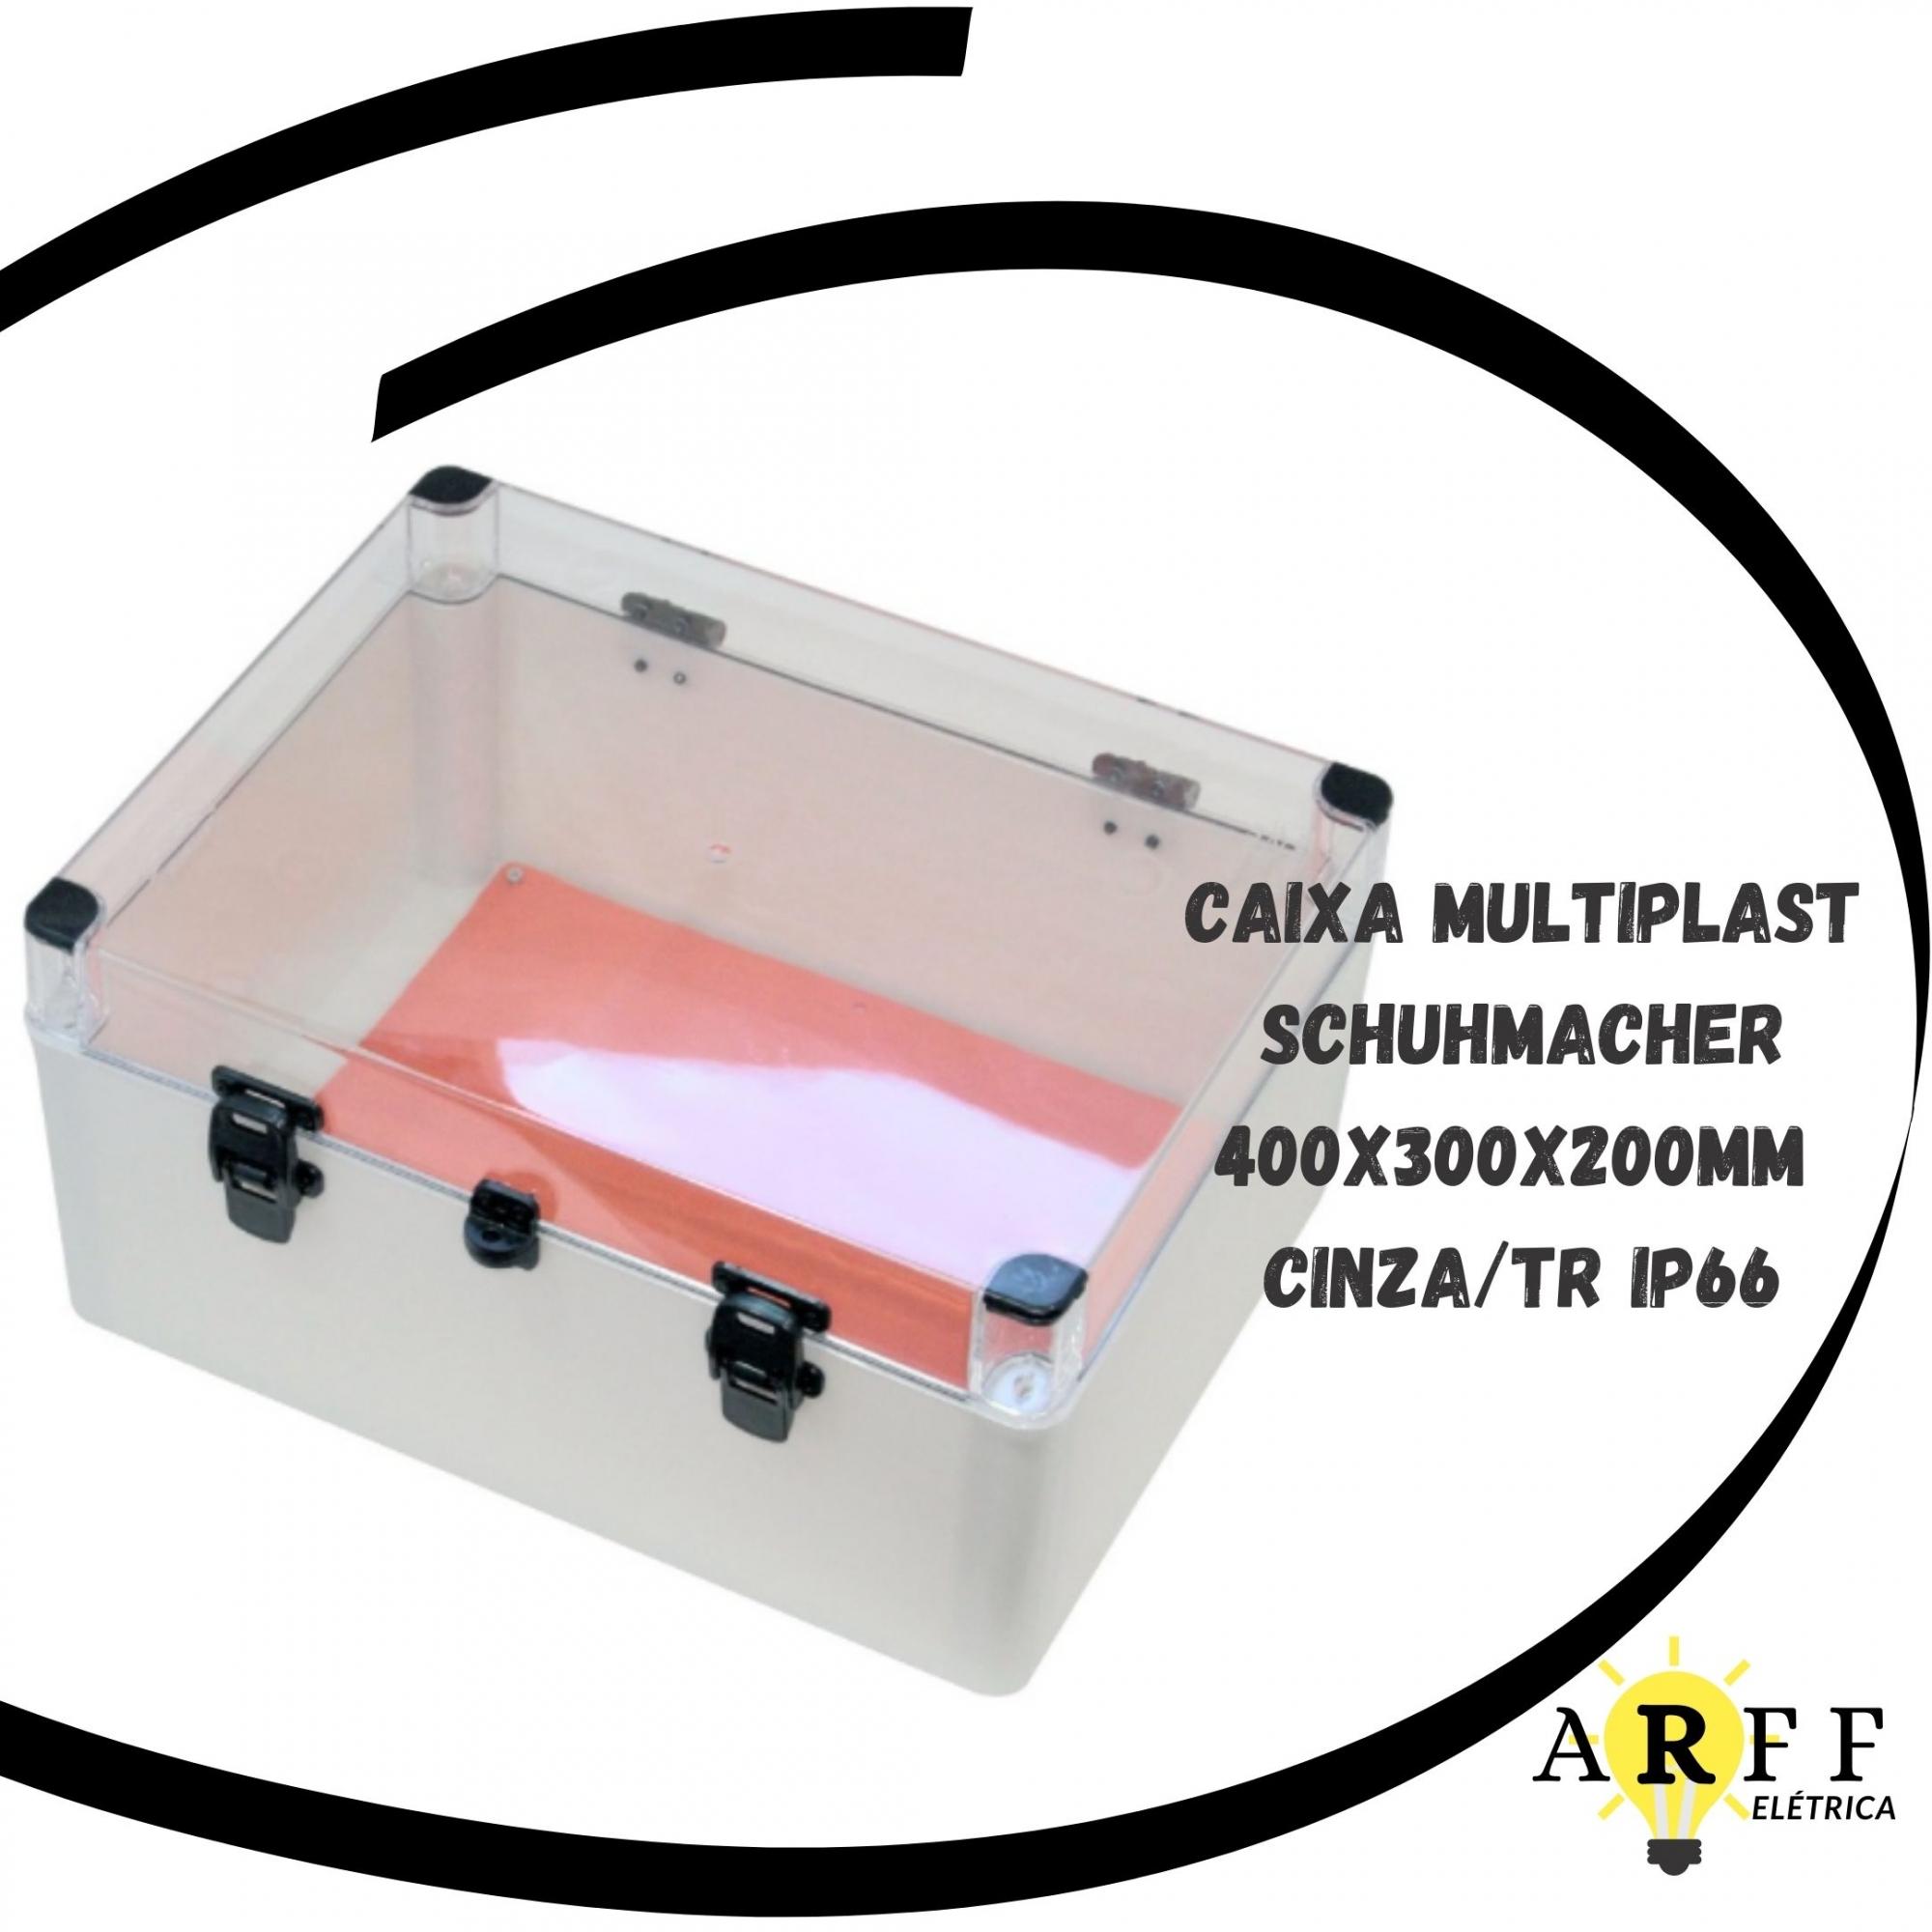 Caixa Multiplast 400x300x200mm Cinza  Ip-66 Schuhmacher